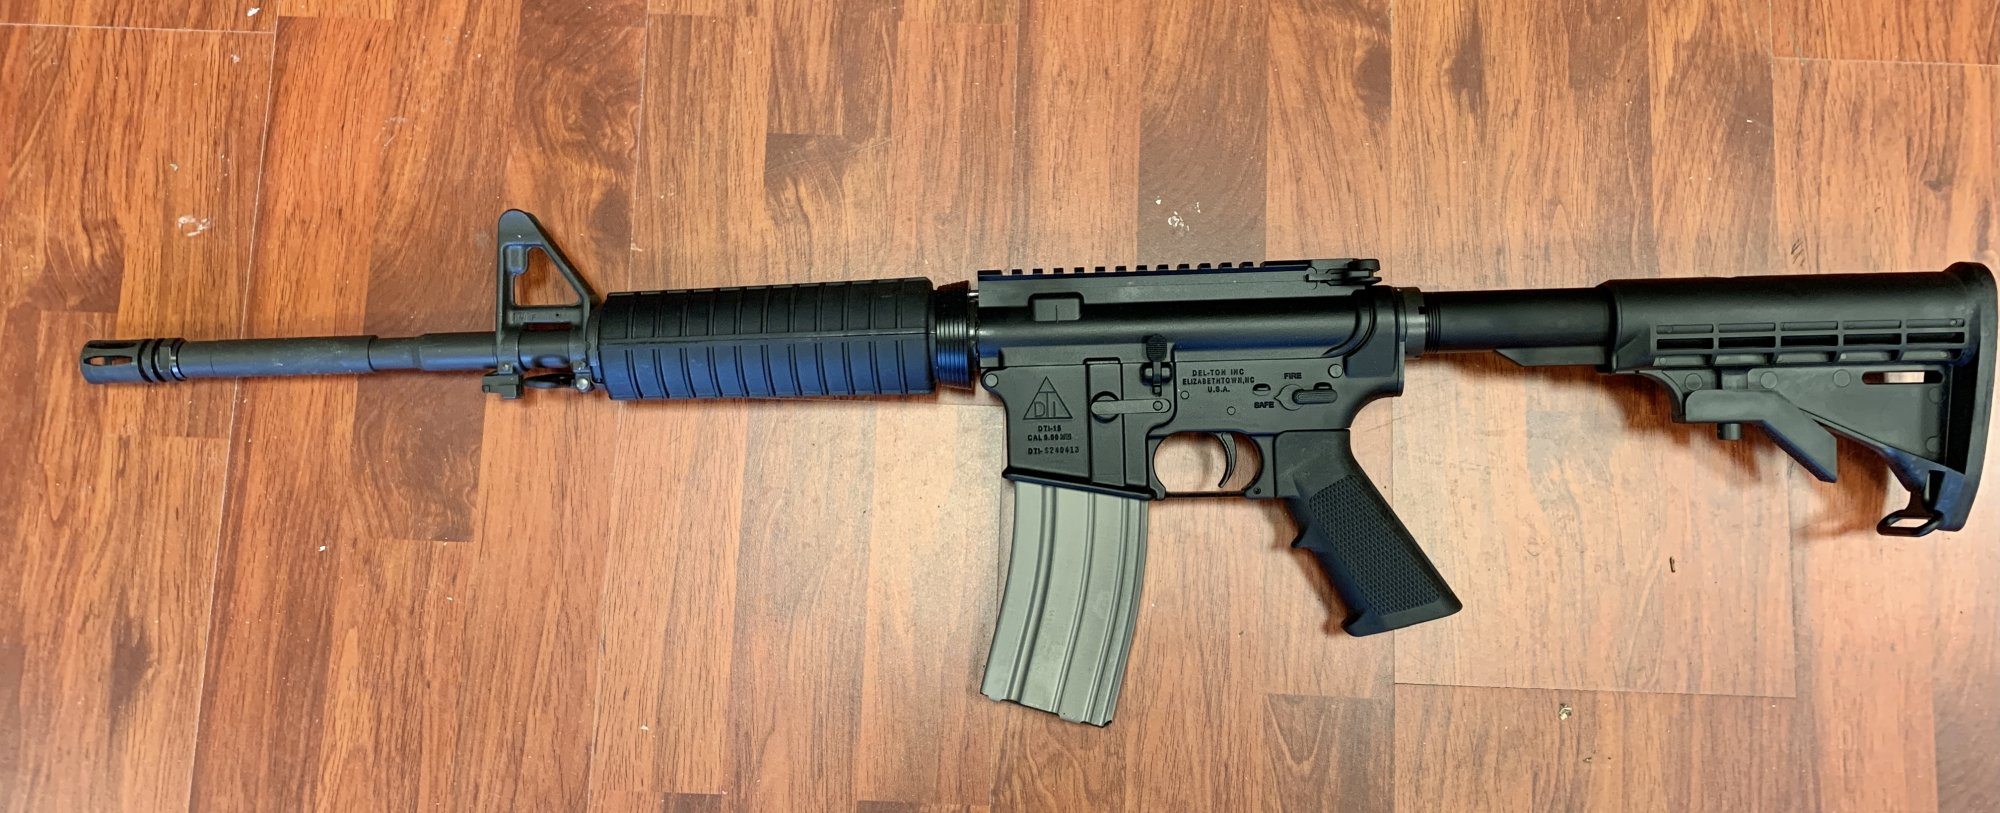 Del-Ton Echo 316 AR-15 5.56 Rifle - Black